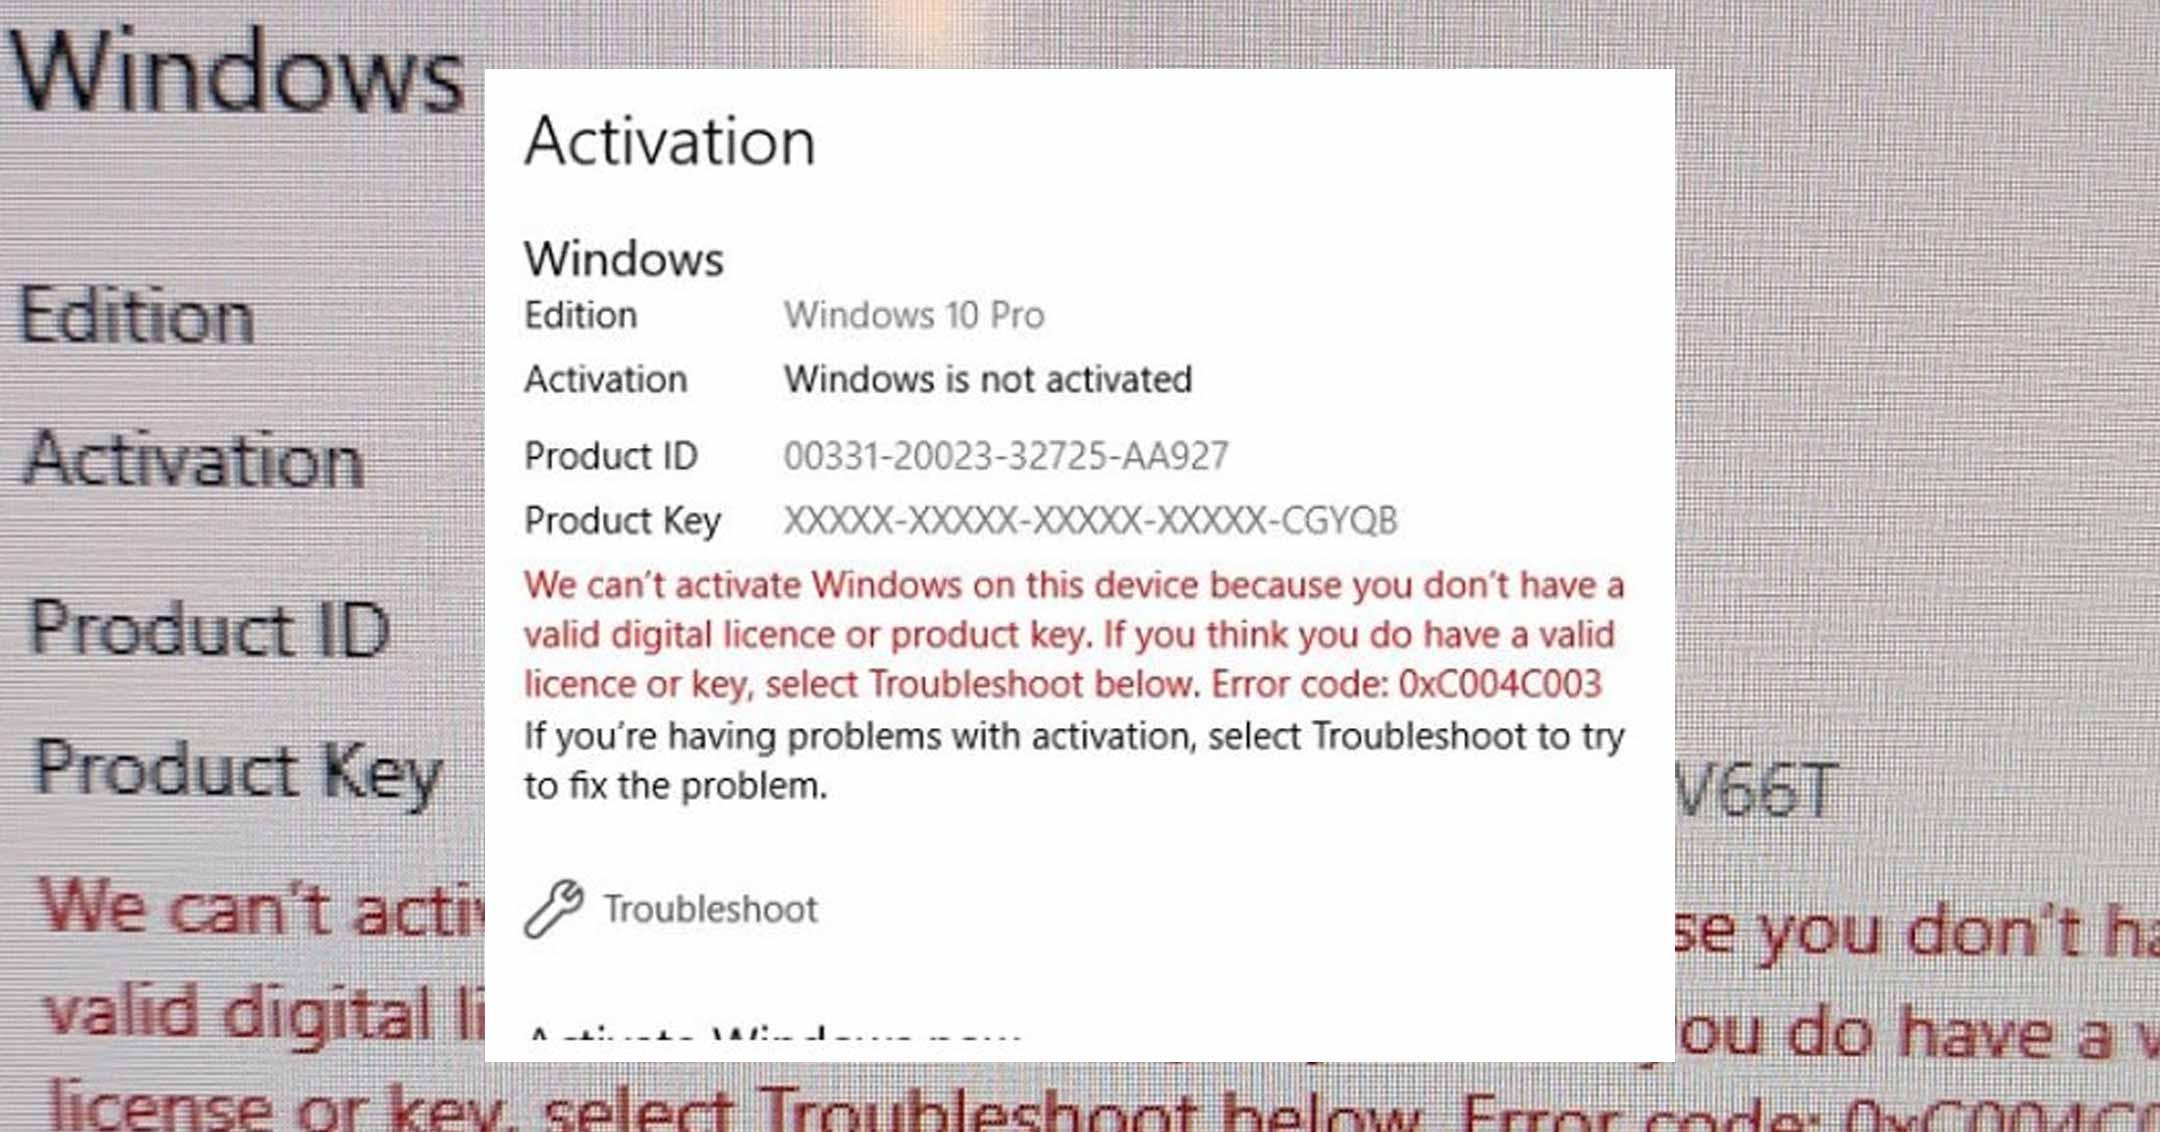 NEVER buy digital licenses from Microsoft | DaveTavres.com